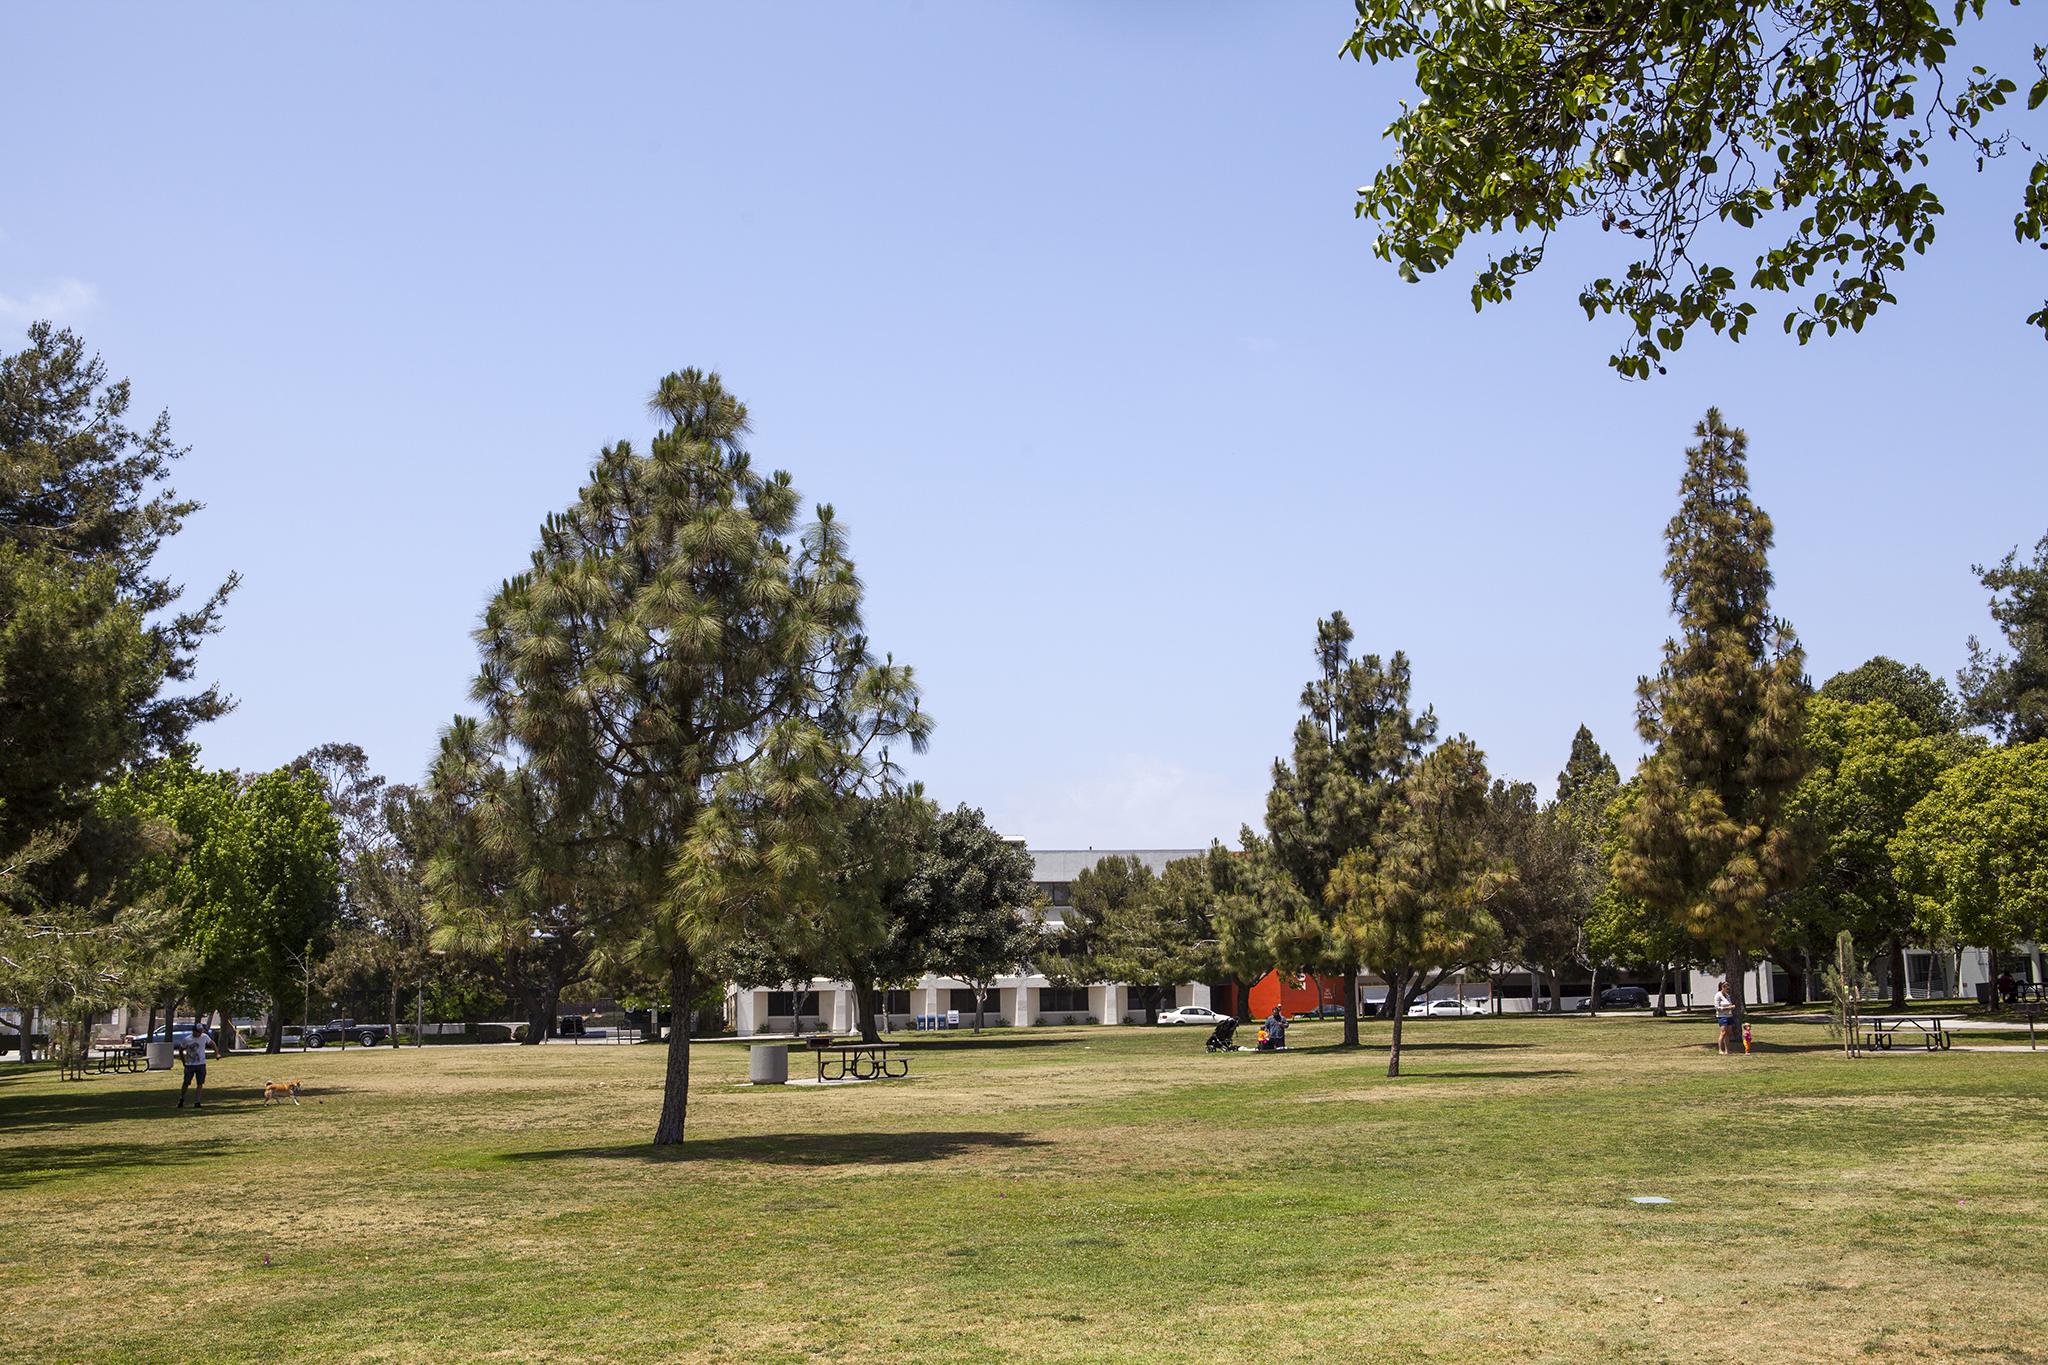 Clover Park